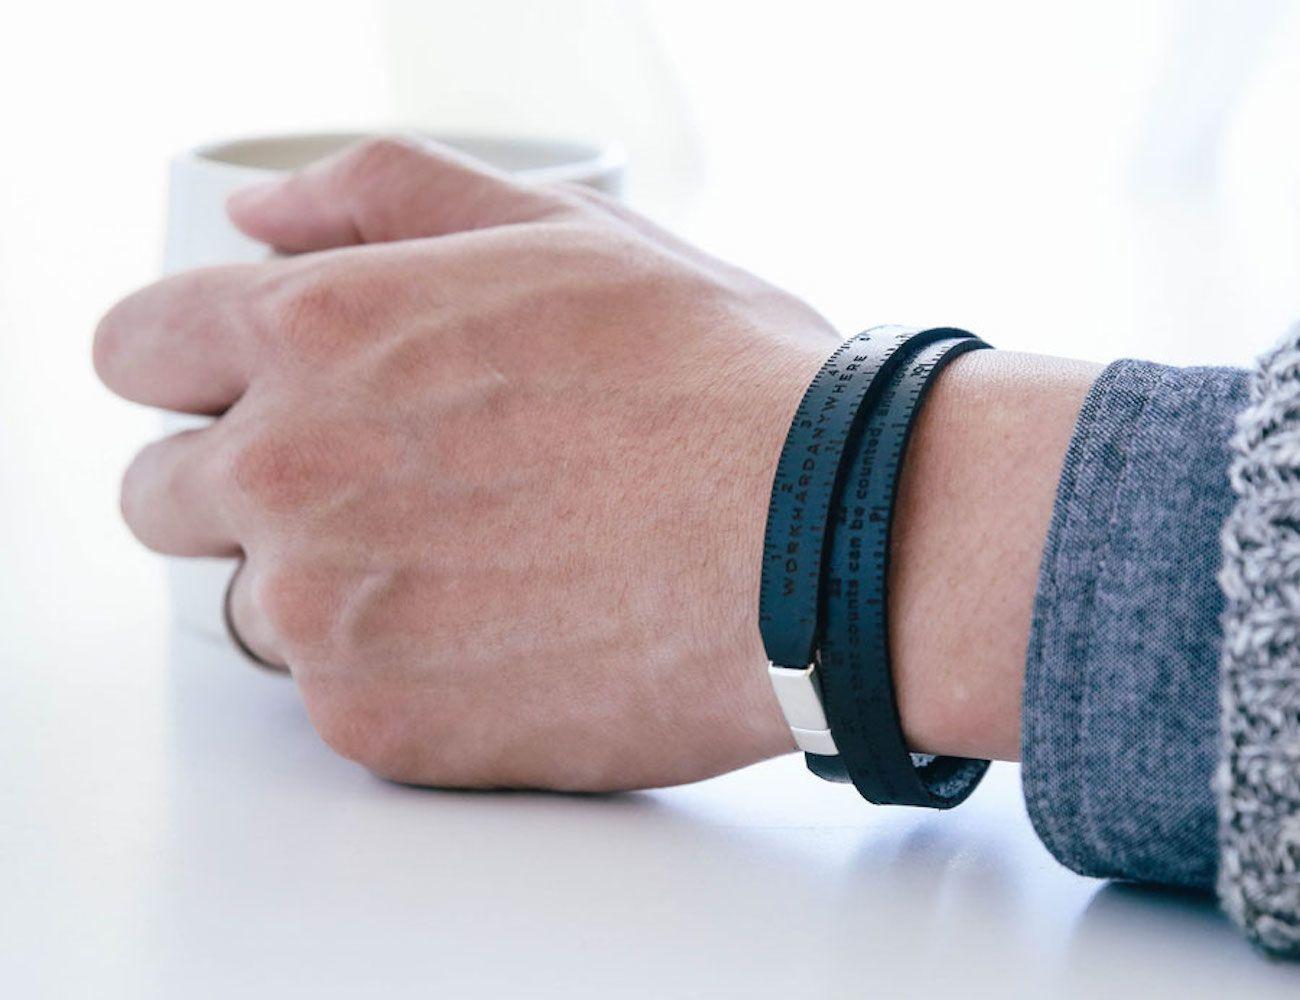 Workhard Anywhere Leather Ruler Bracelet